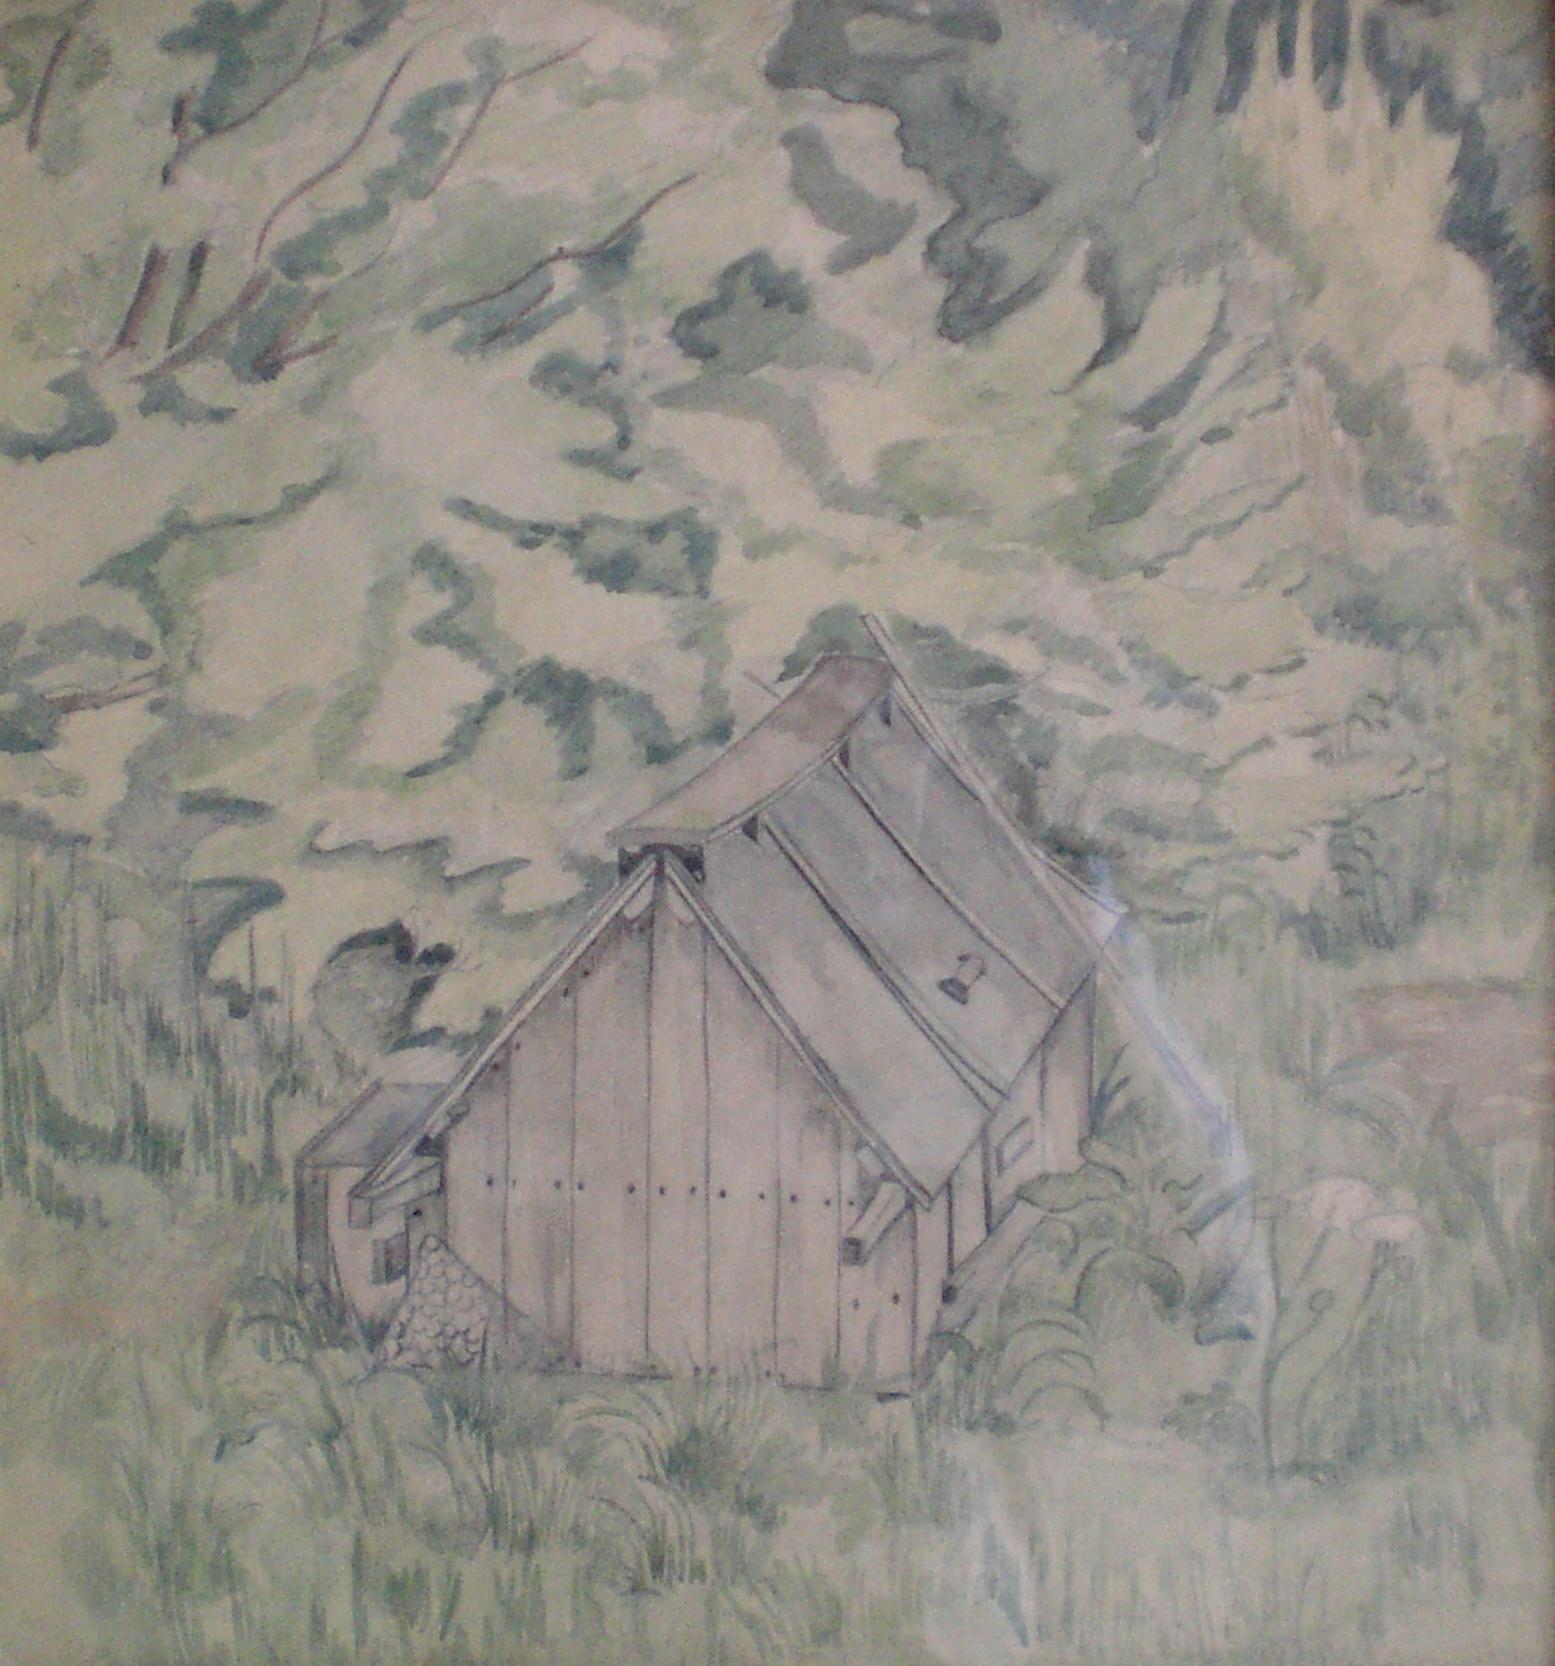 The Hen Coop - 1940s Modern British watercolour by Pamela Spencer